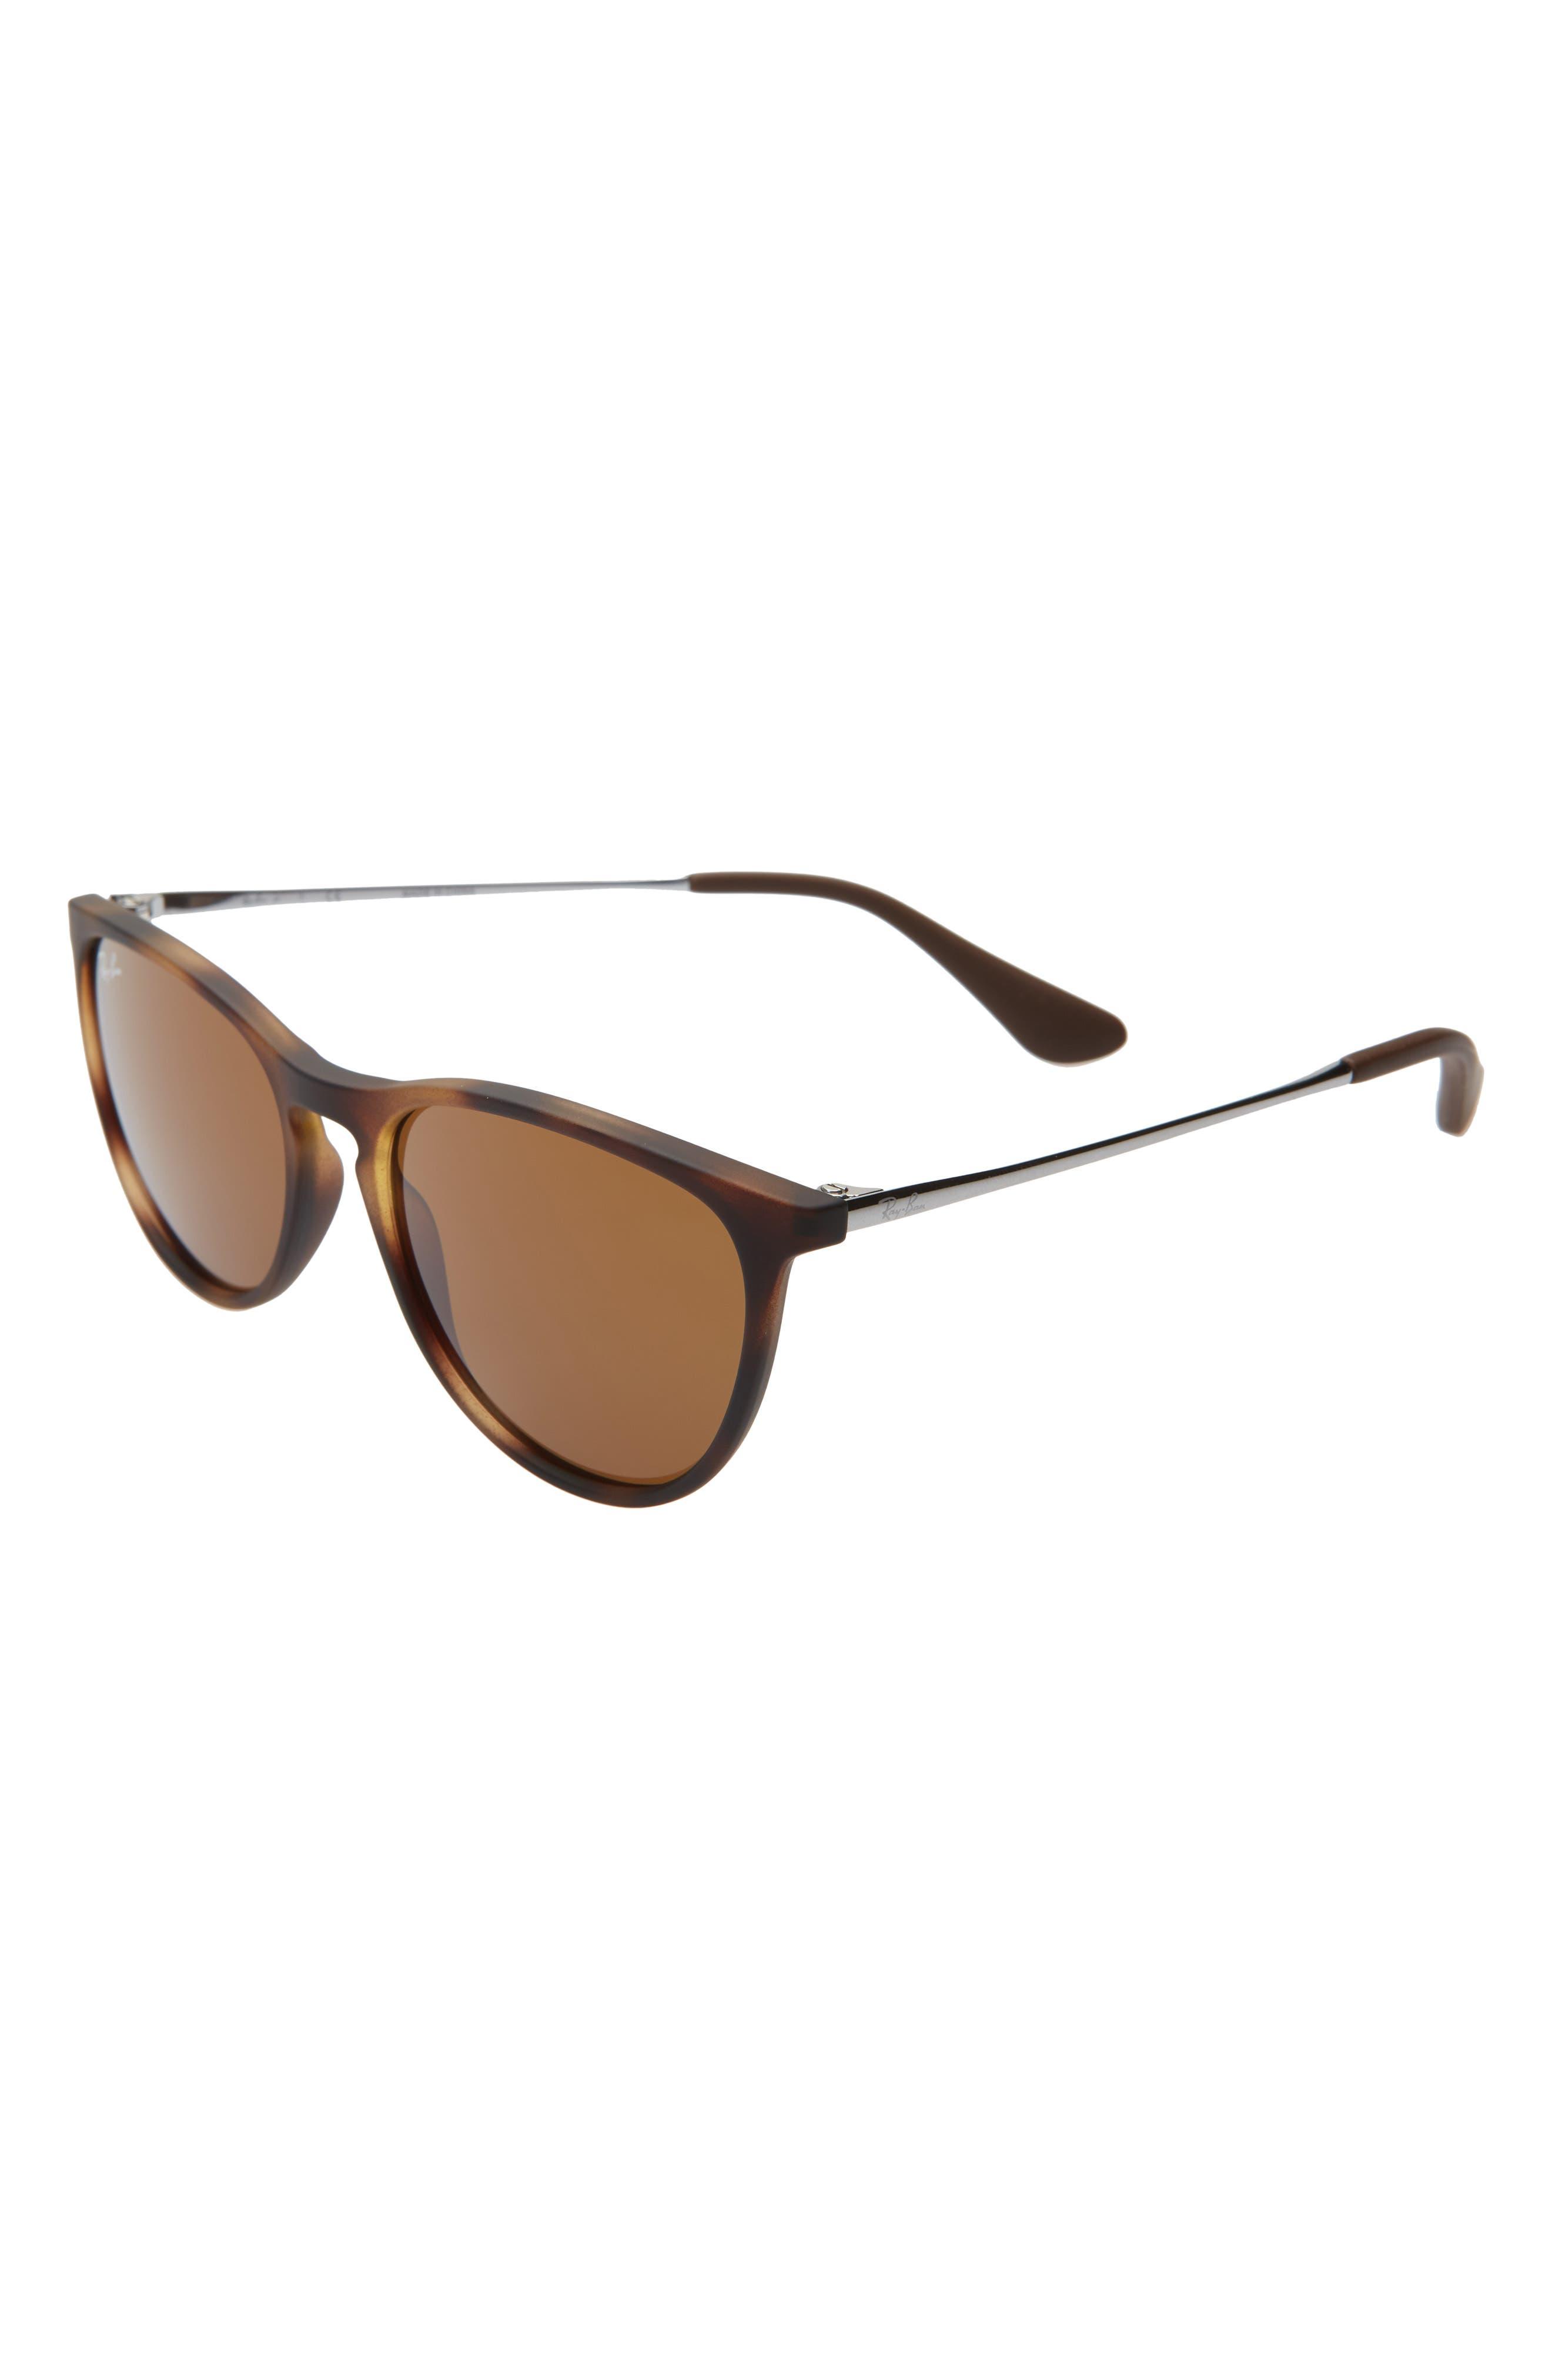 Girls RayBan Junior 50Mm Round Sunglasses  Havana Brown Solid